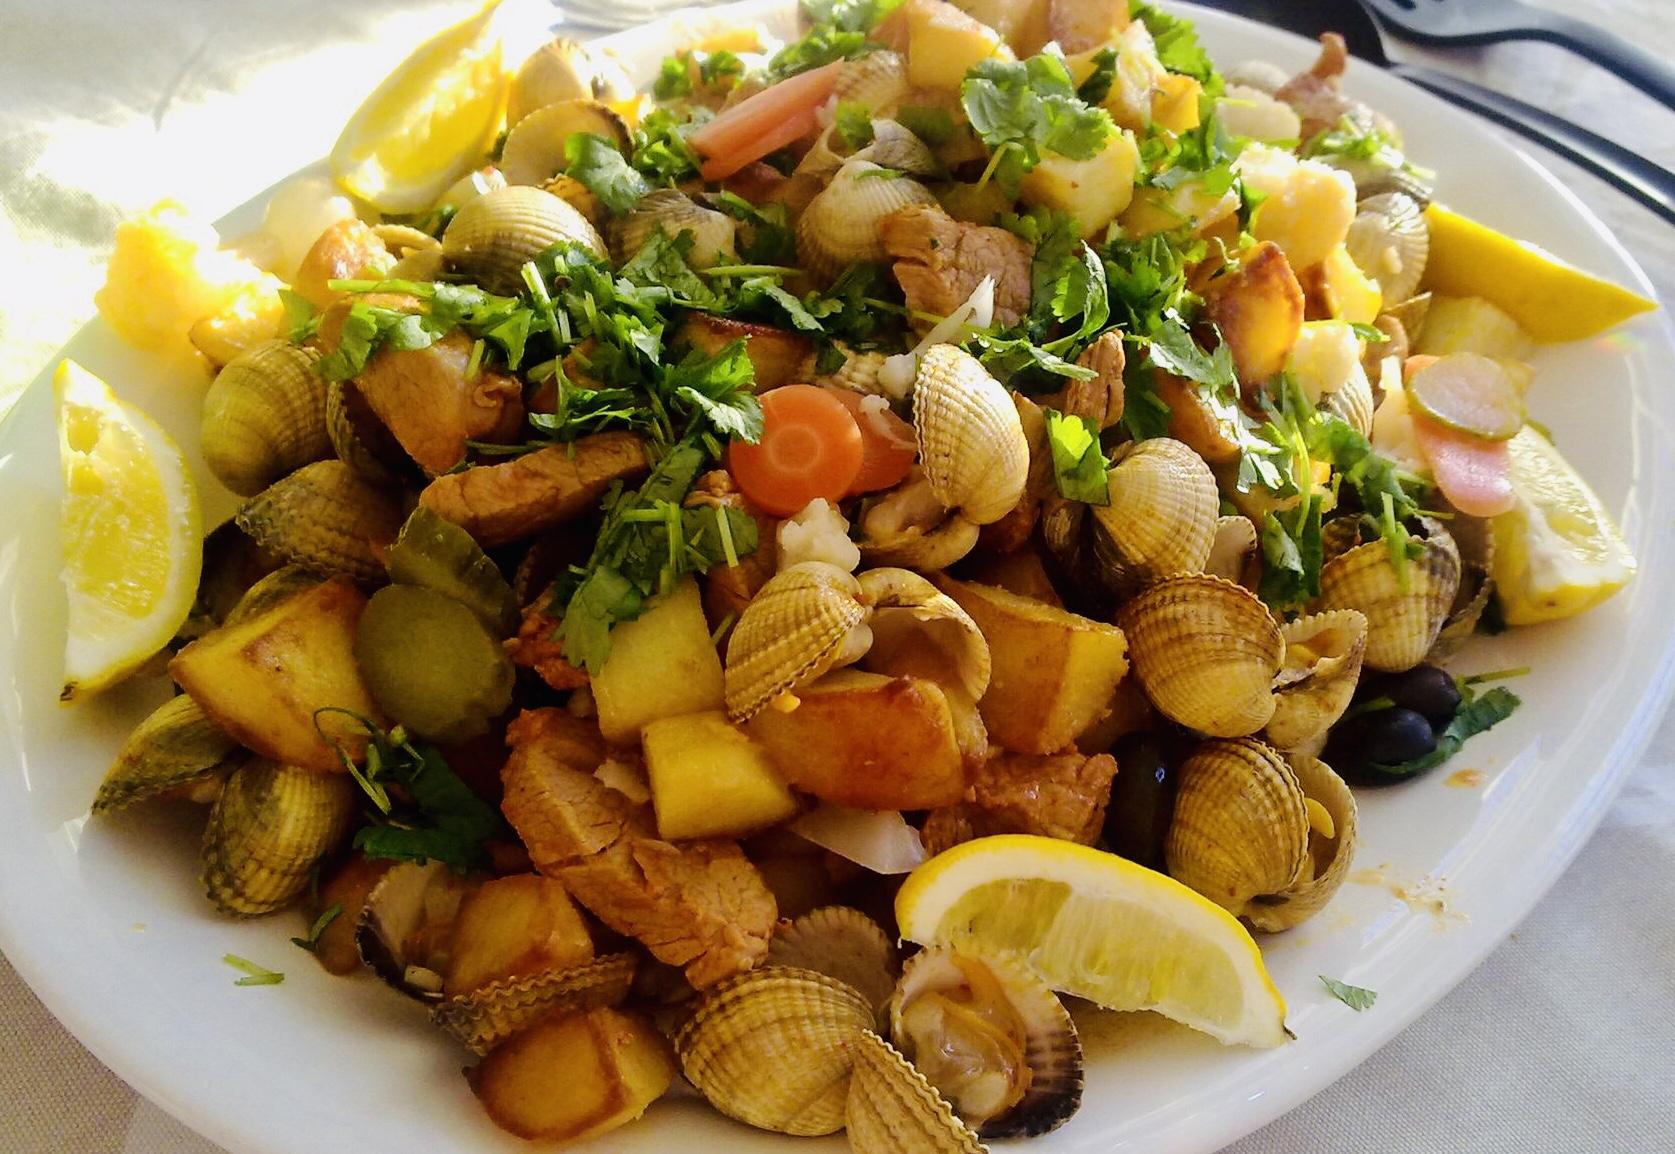 Recept carne de porco à alentejana com amêijoas fläskkött med musslor